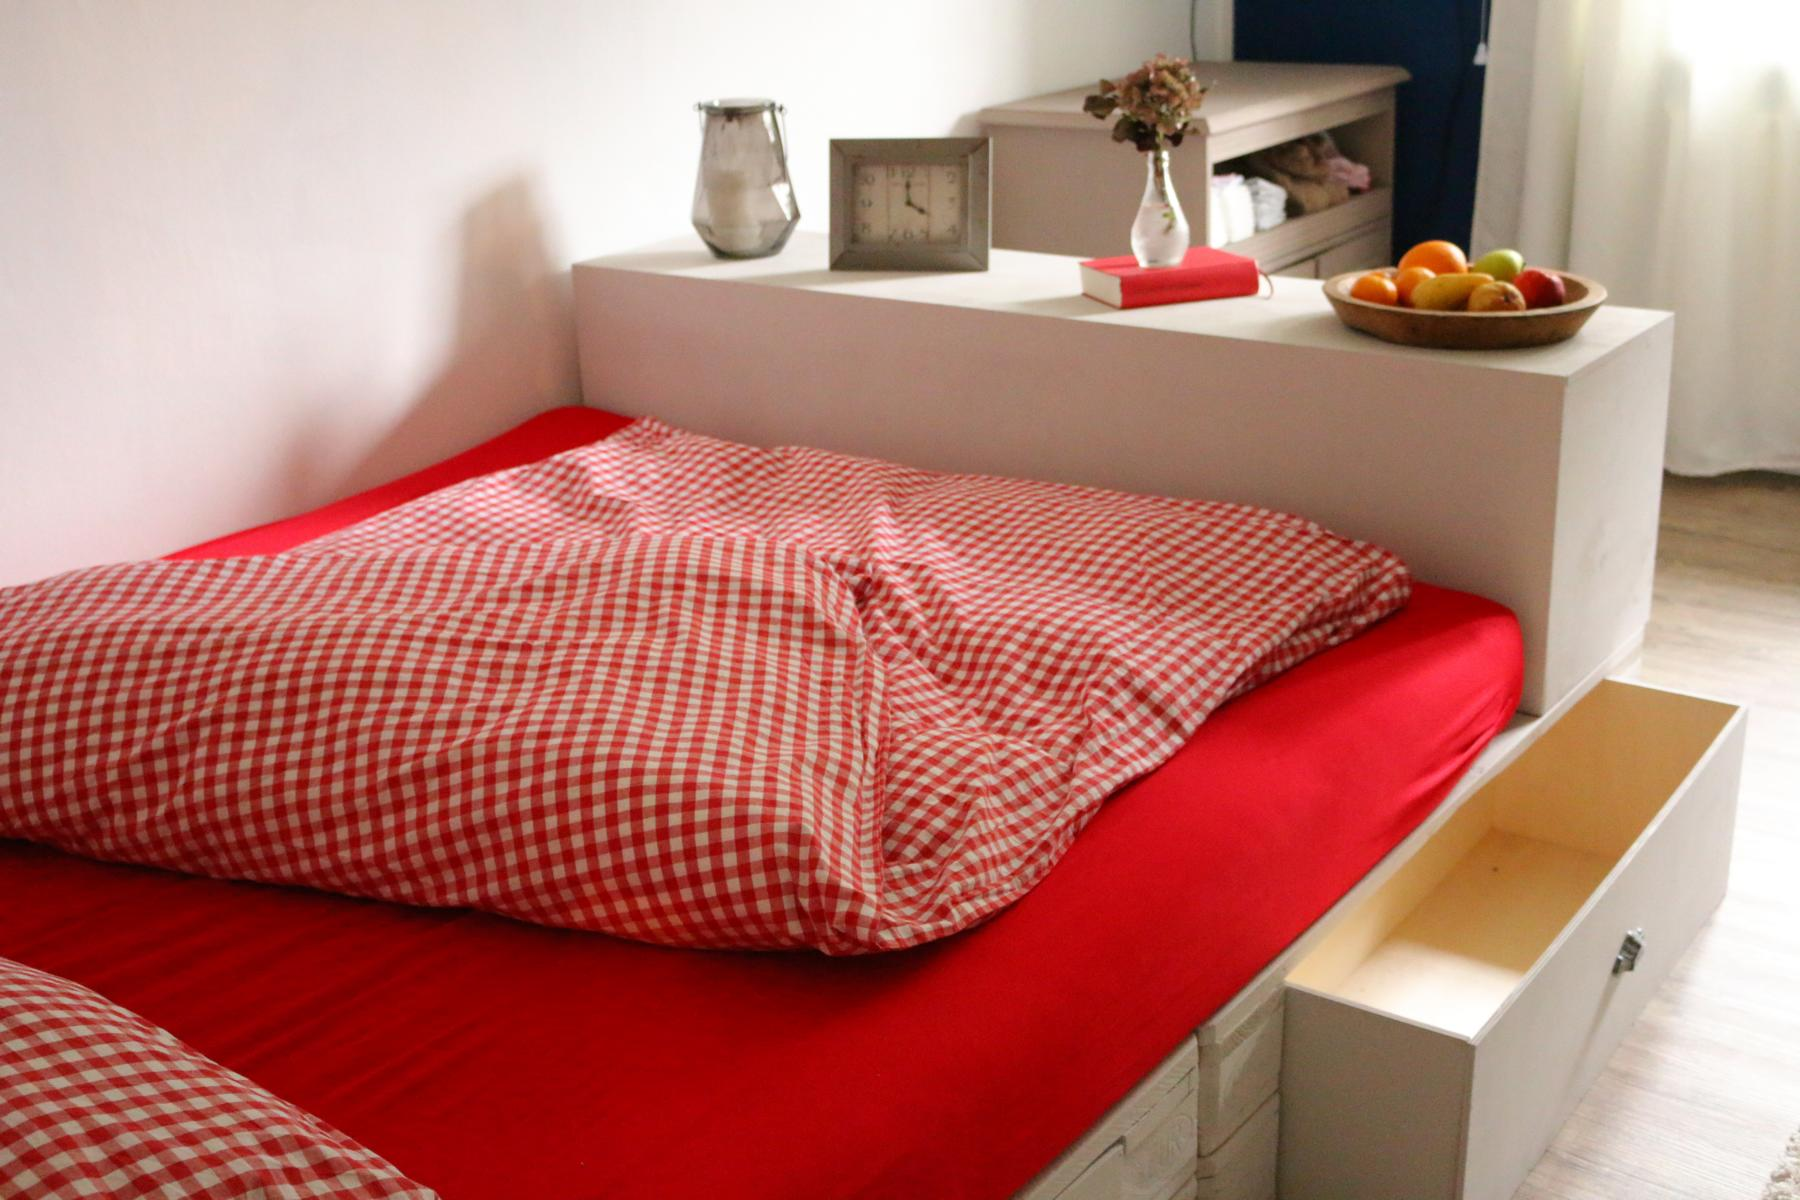 Palettenbett-kaufen-Bett aus Europaletten